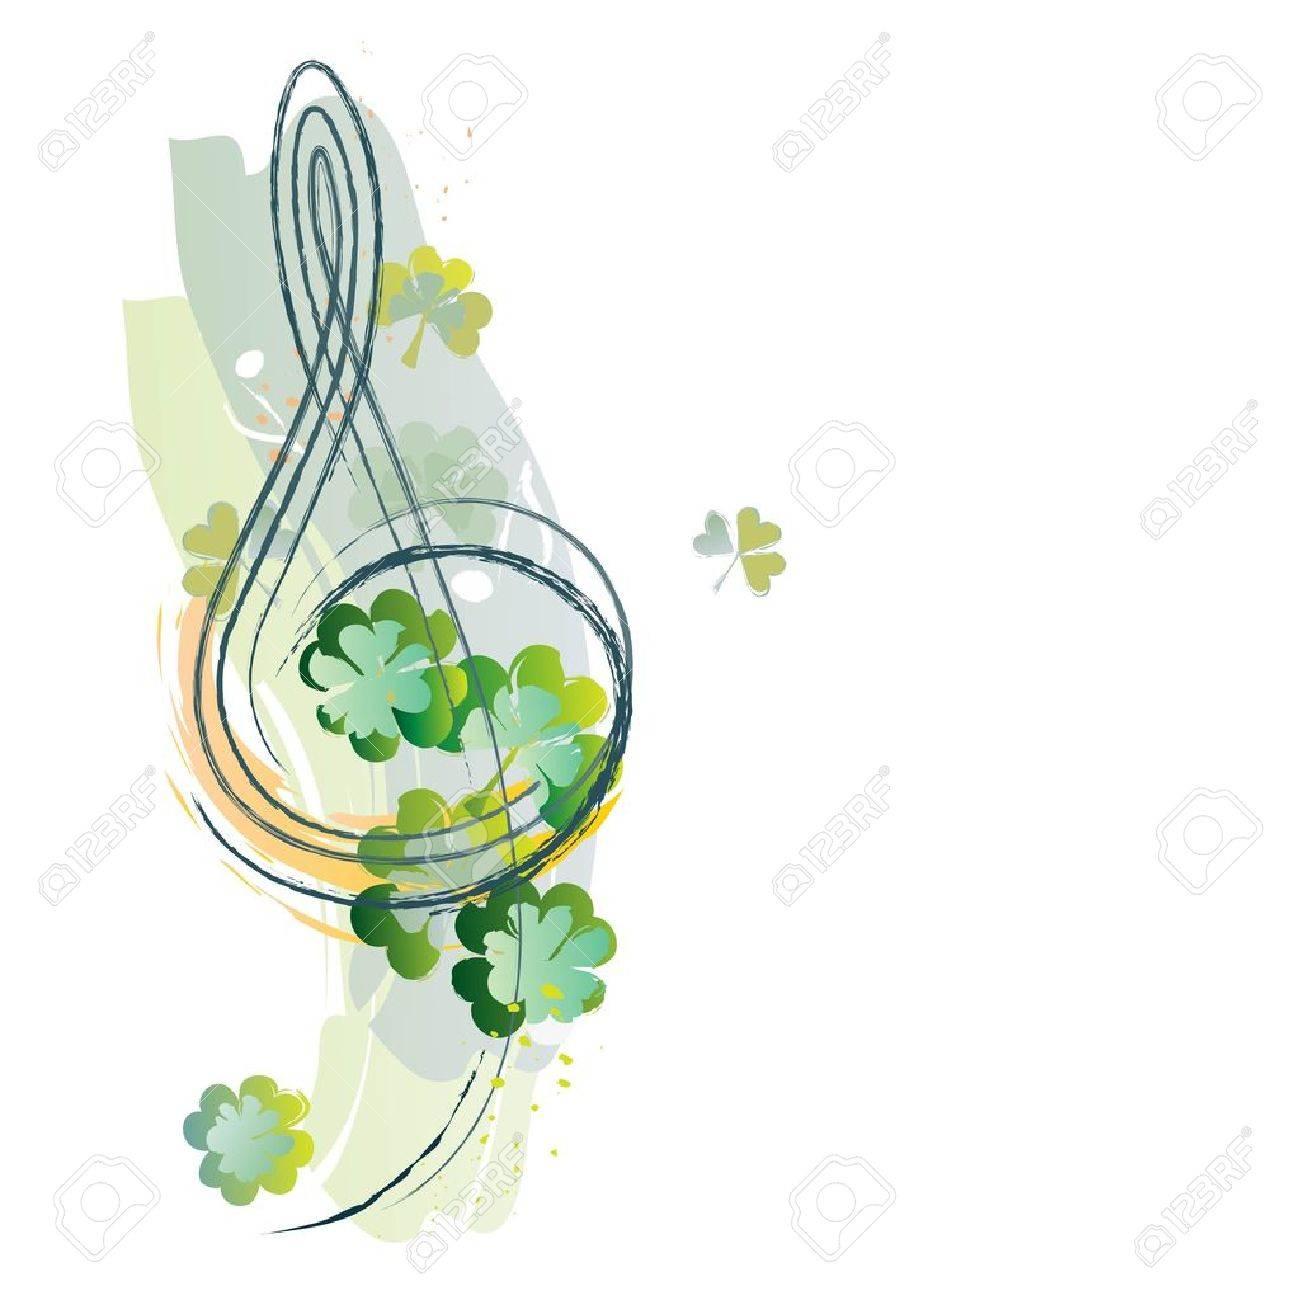 treble clef and irish shamrock royalty free cliparts vectors and